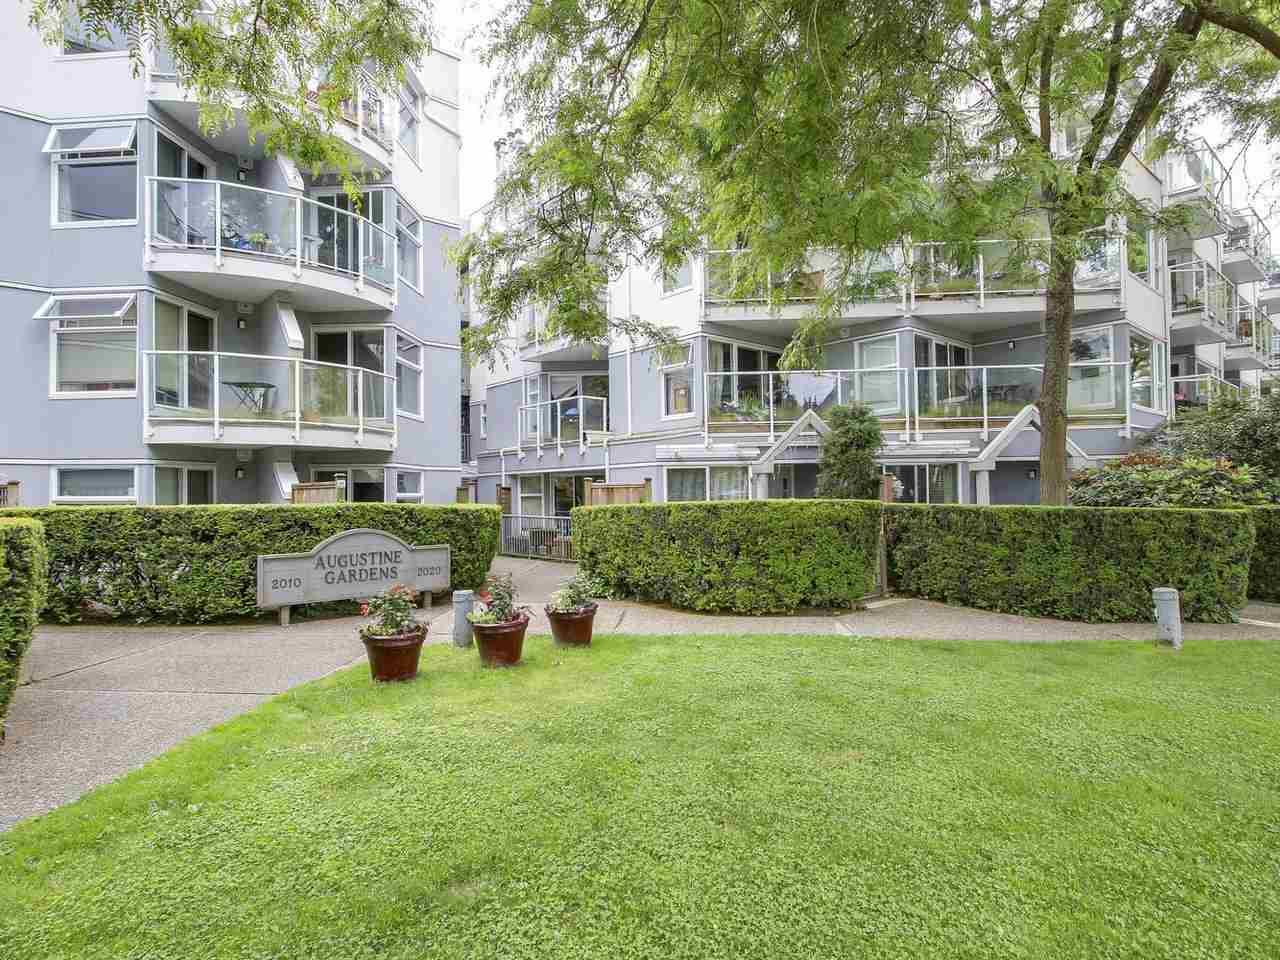 Sold: 312 - 2020 W 8th Avenue, Vancouver, BC